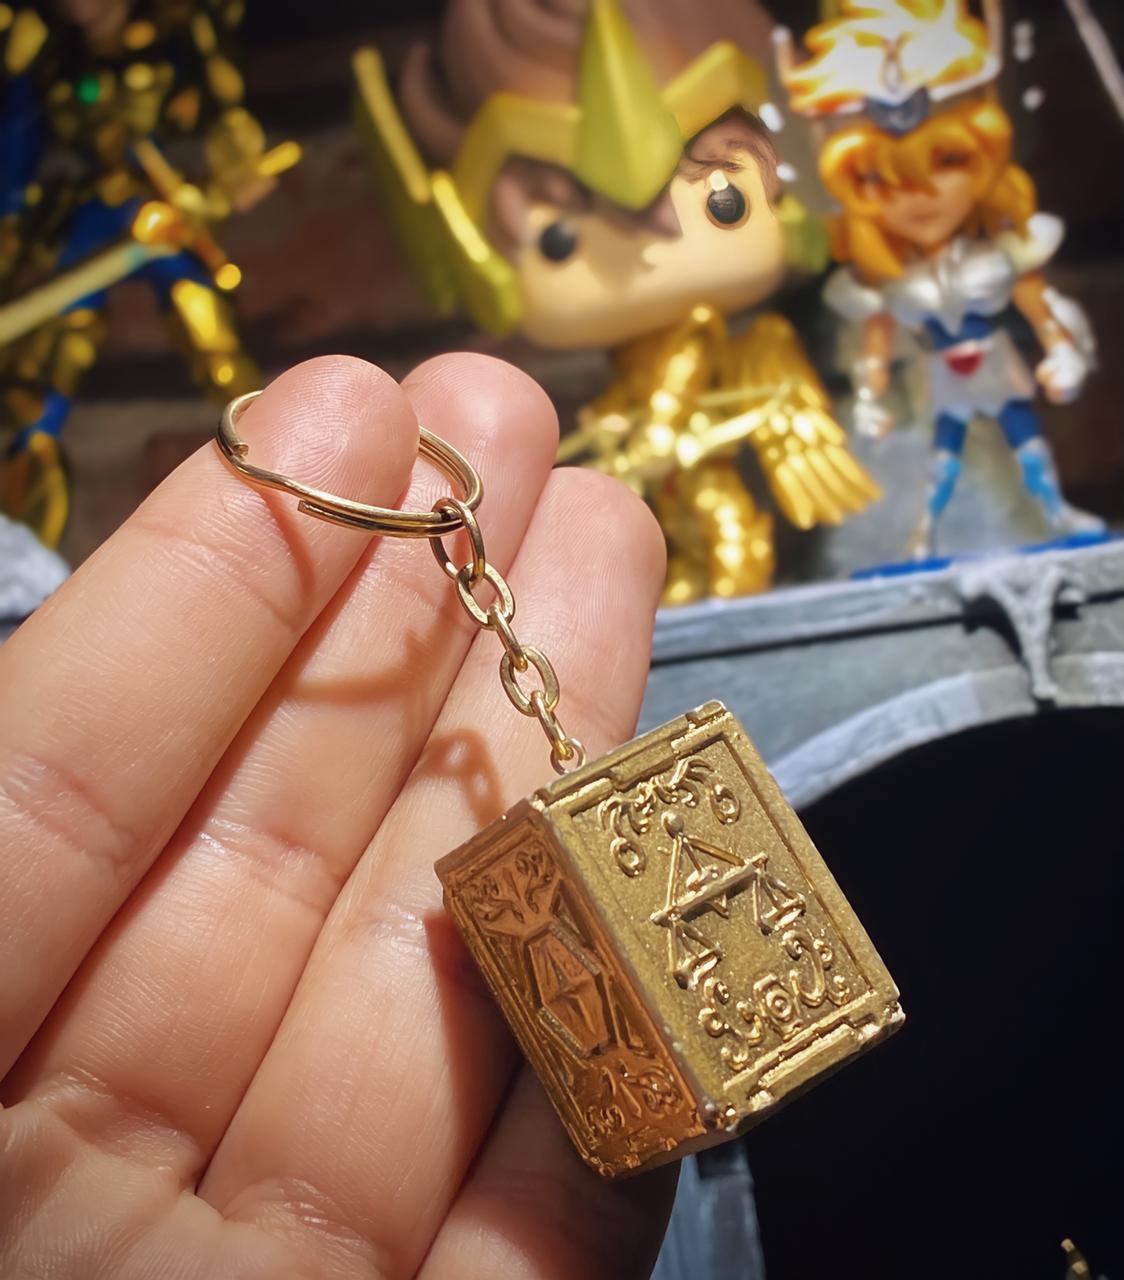 Chaveiro Caixa de Pandora Urna Armadura de Ouro Dohko De Libra Os Cavaleiros do Zodíaco Saint Seiya - Anime Mangá